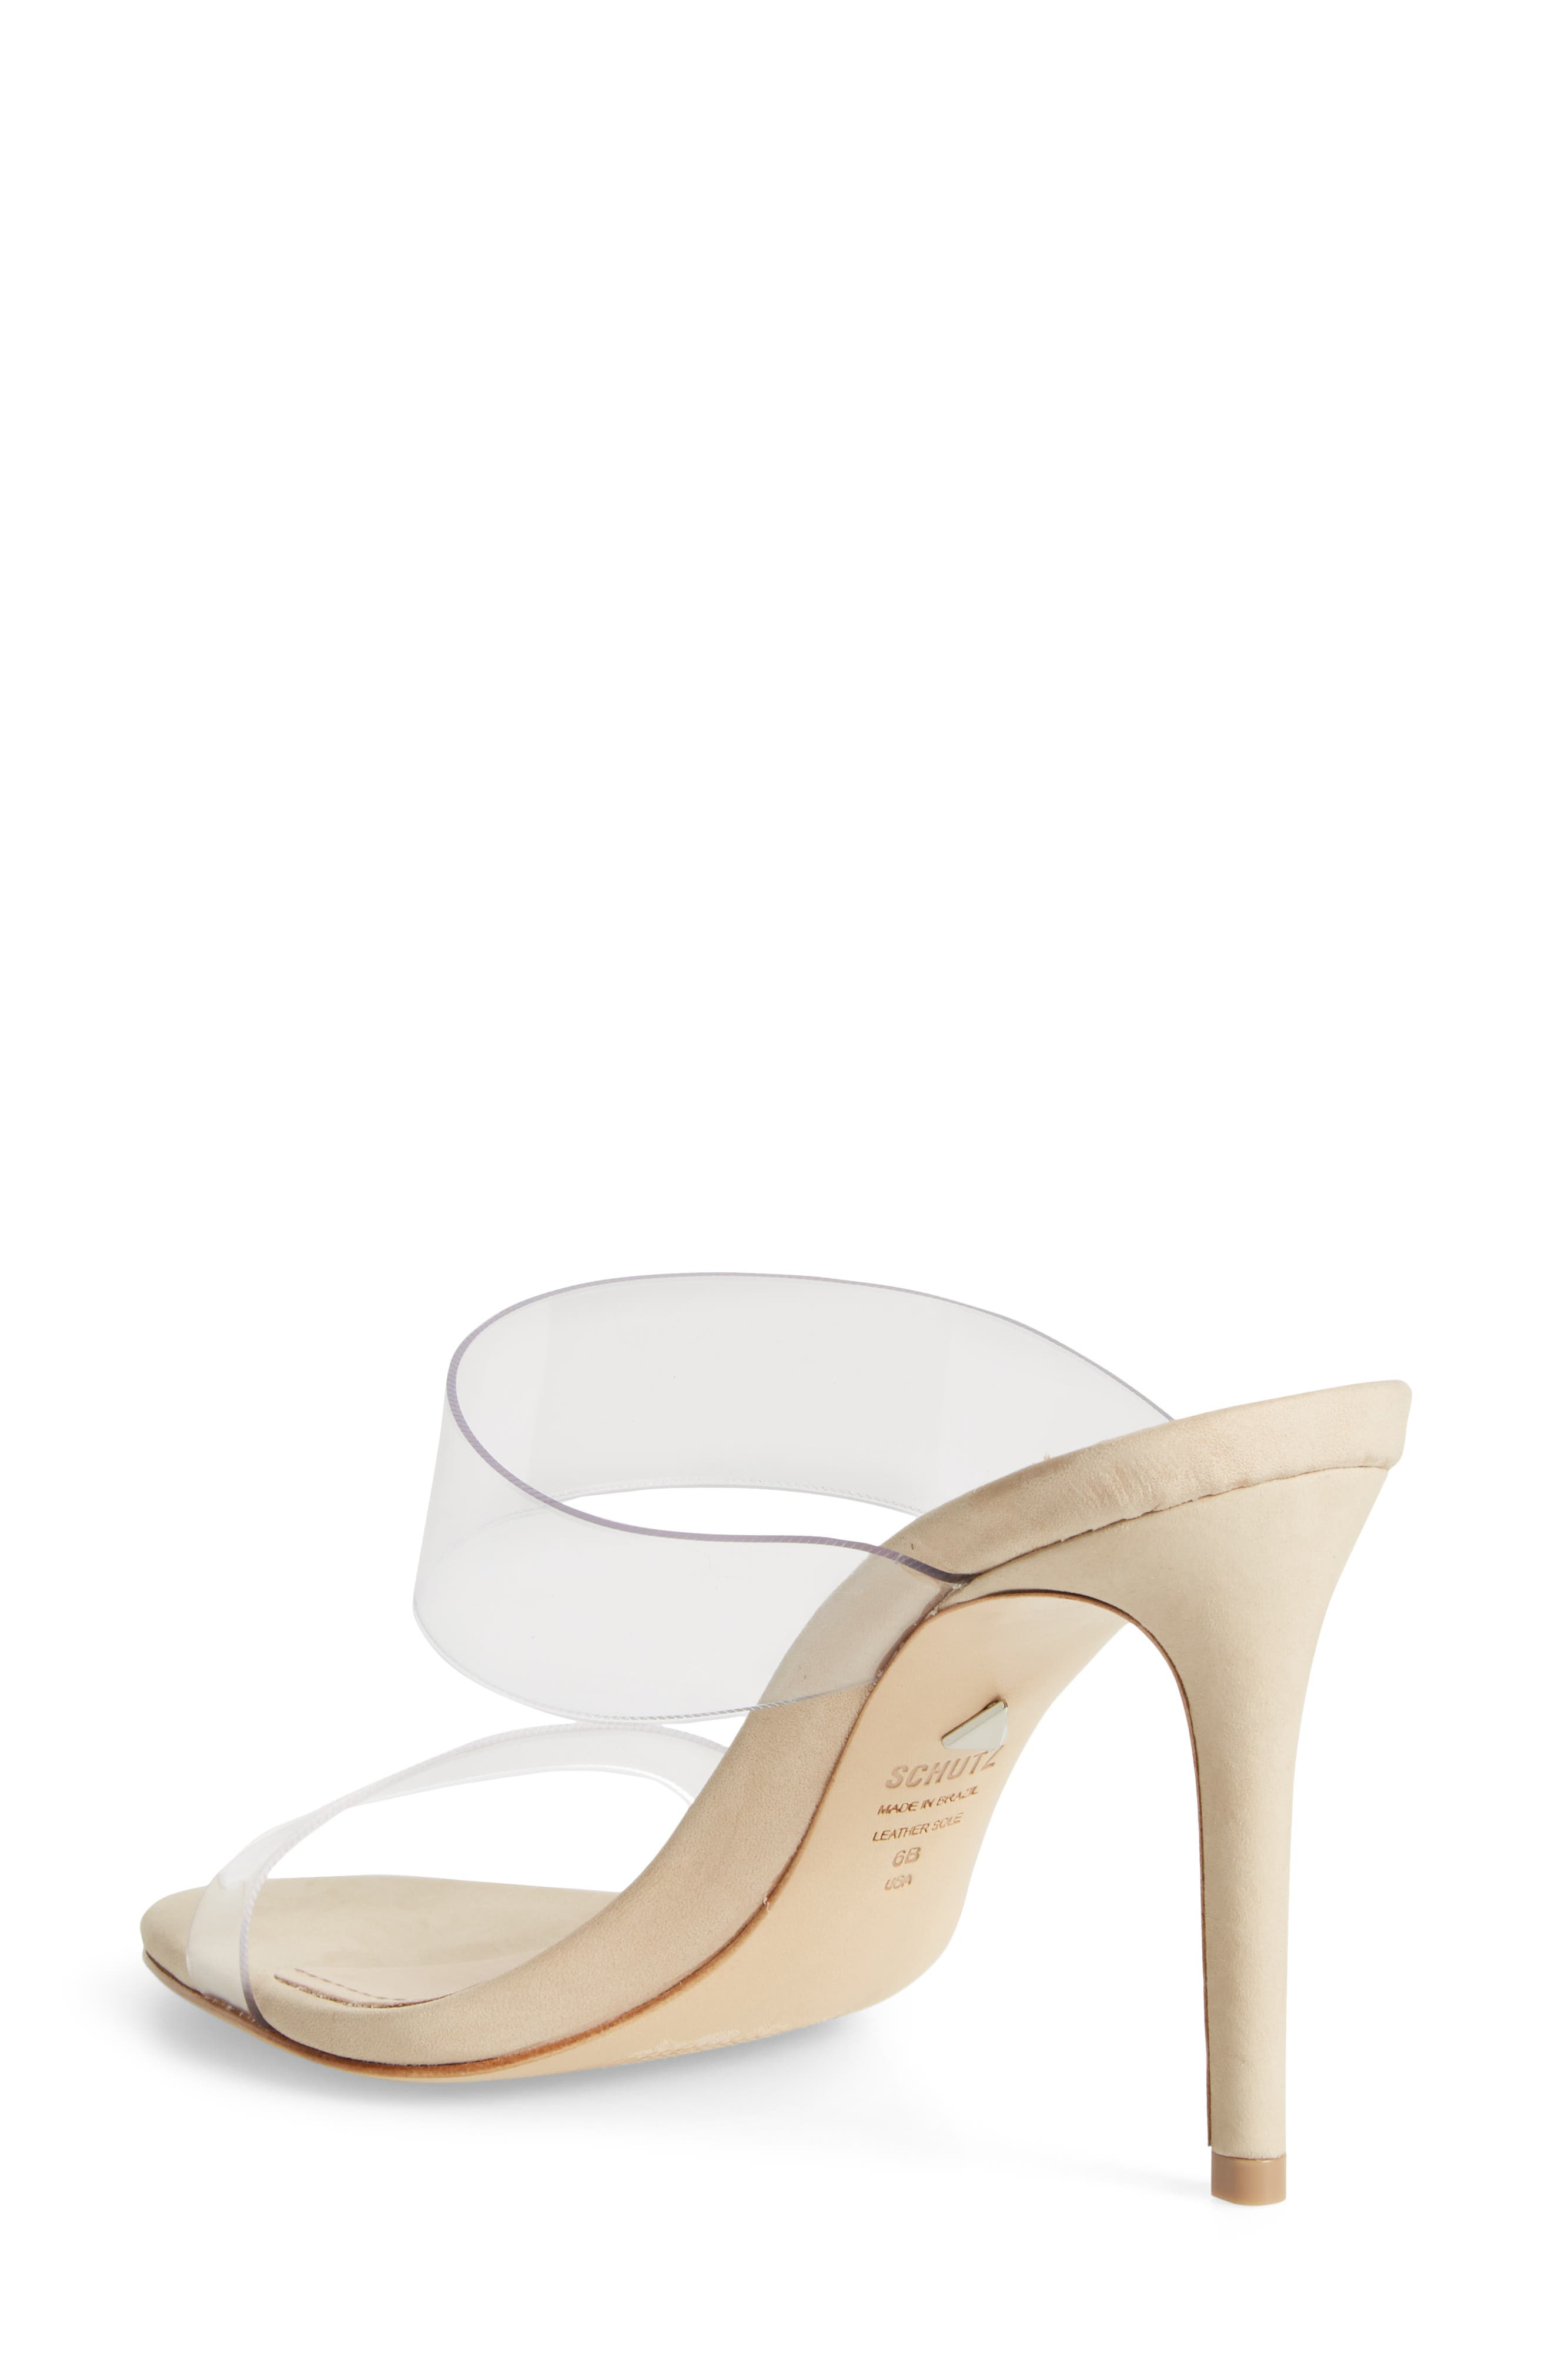 ca7db046c3c Women s Schutz Shoes